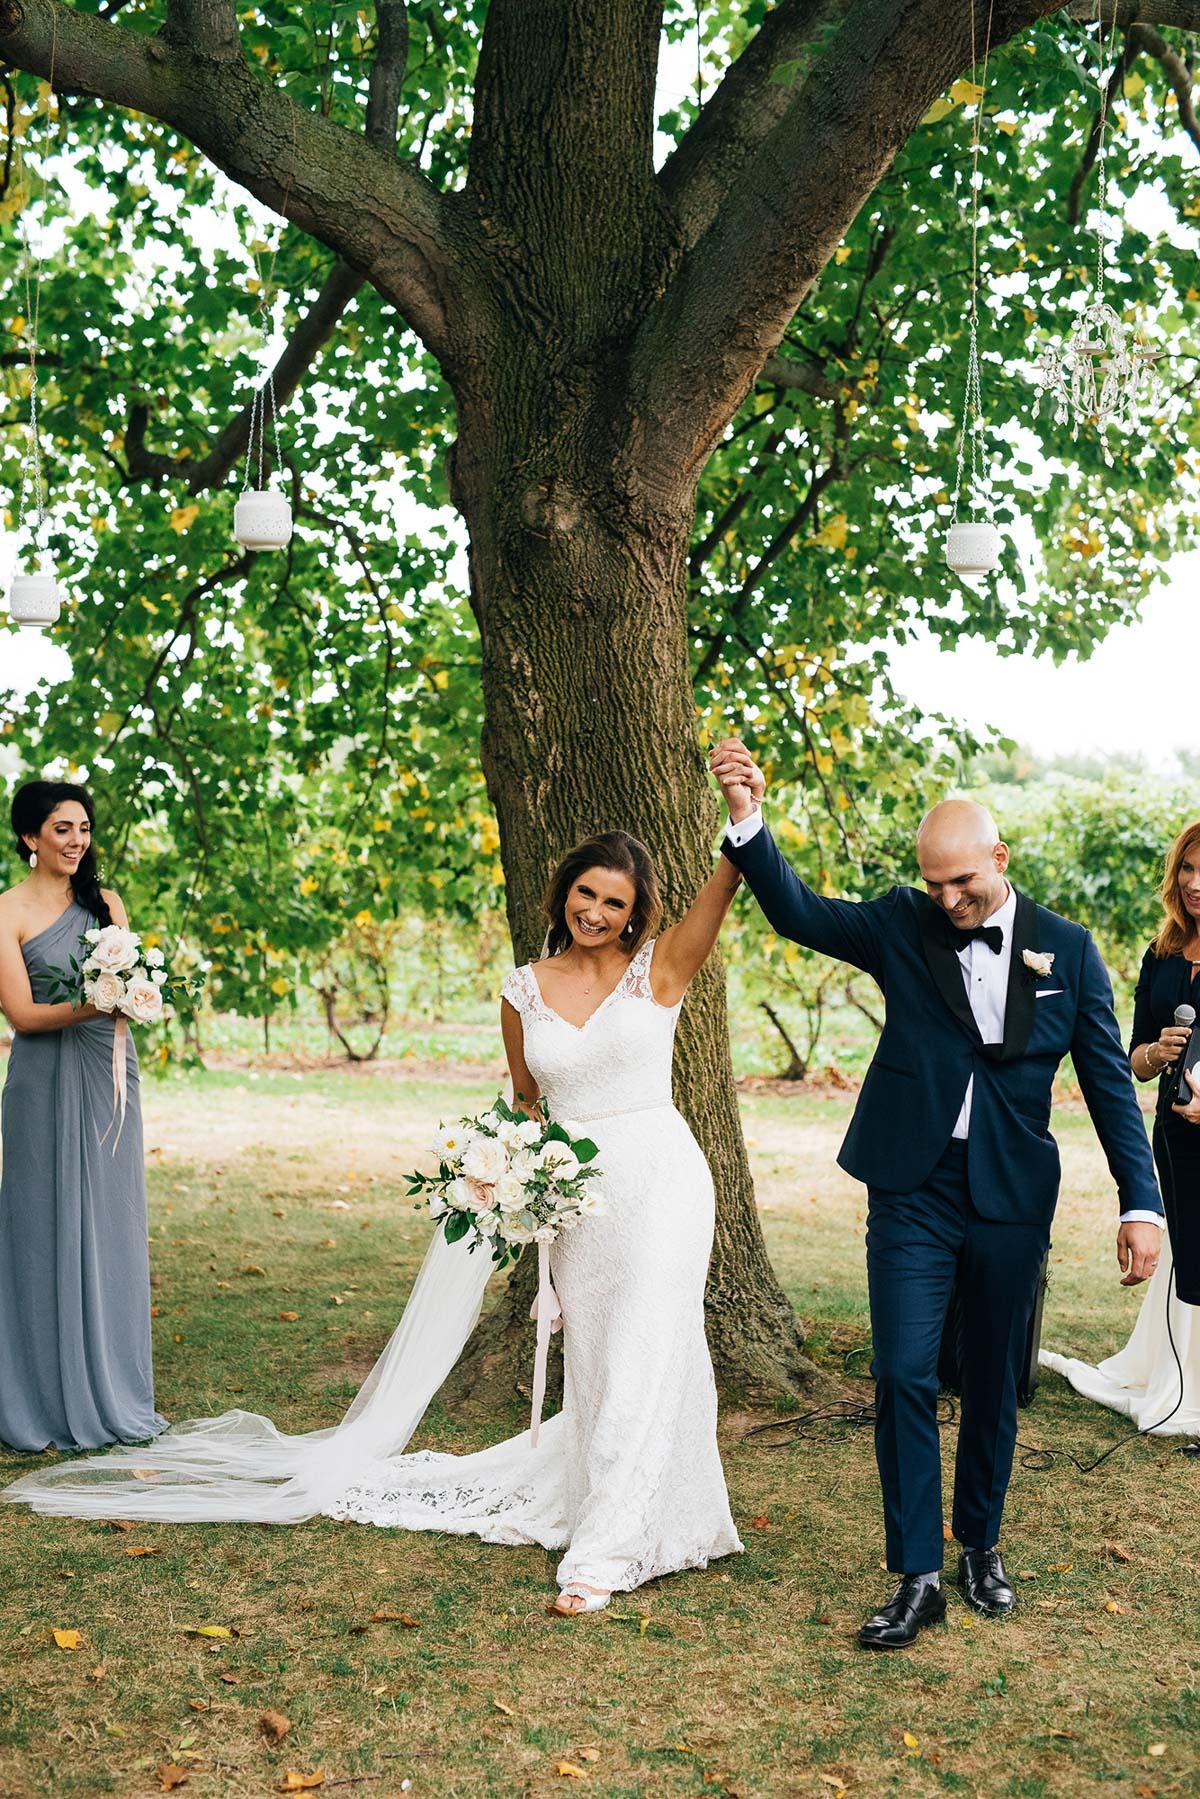 shaw-events-vineyard-bride-swish-list-kurtz-orchards-niagara-on-the-lake-wedding-15.jpg